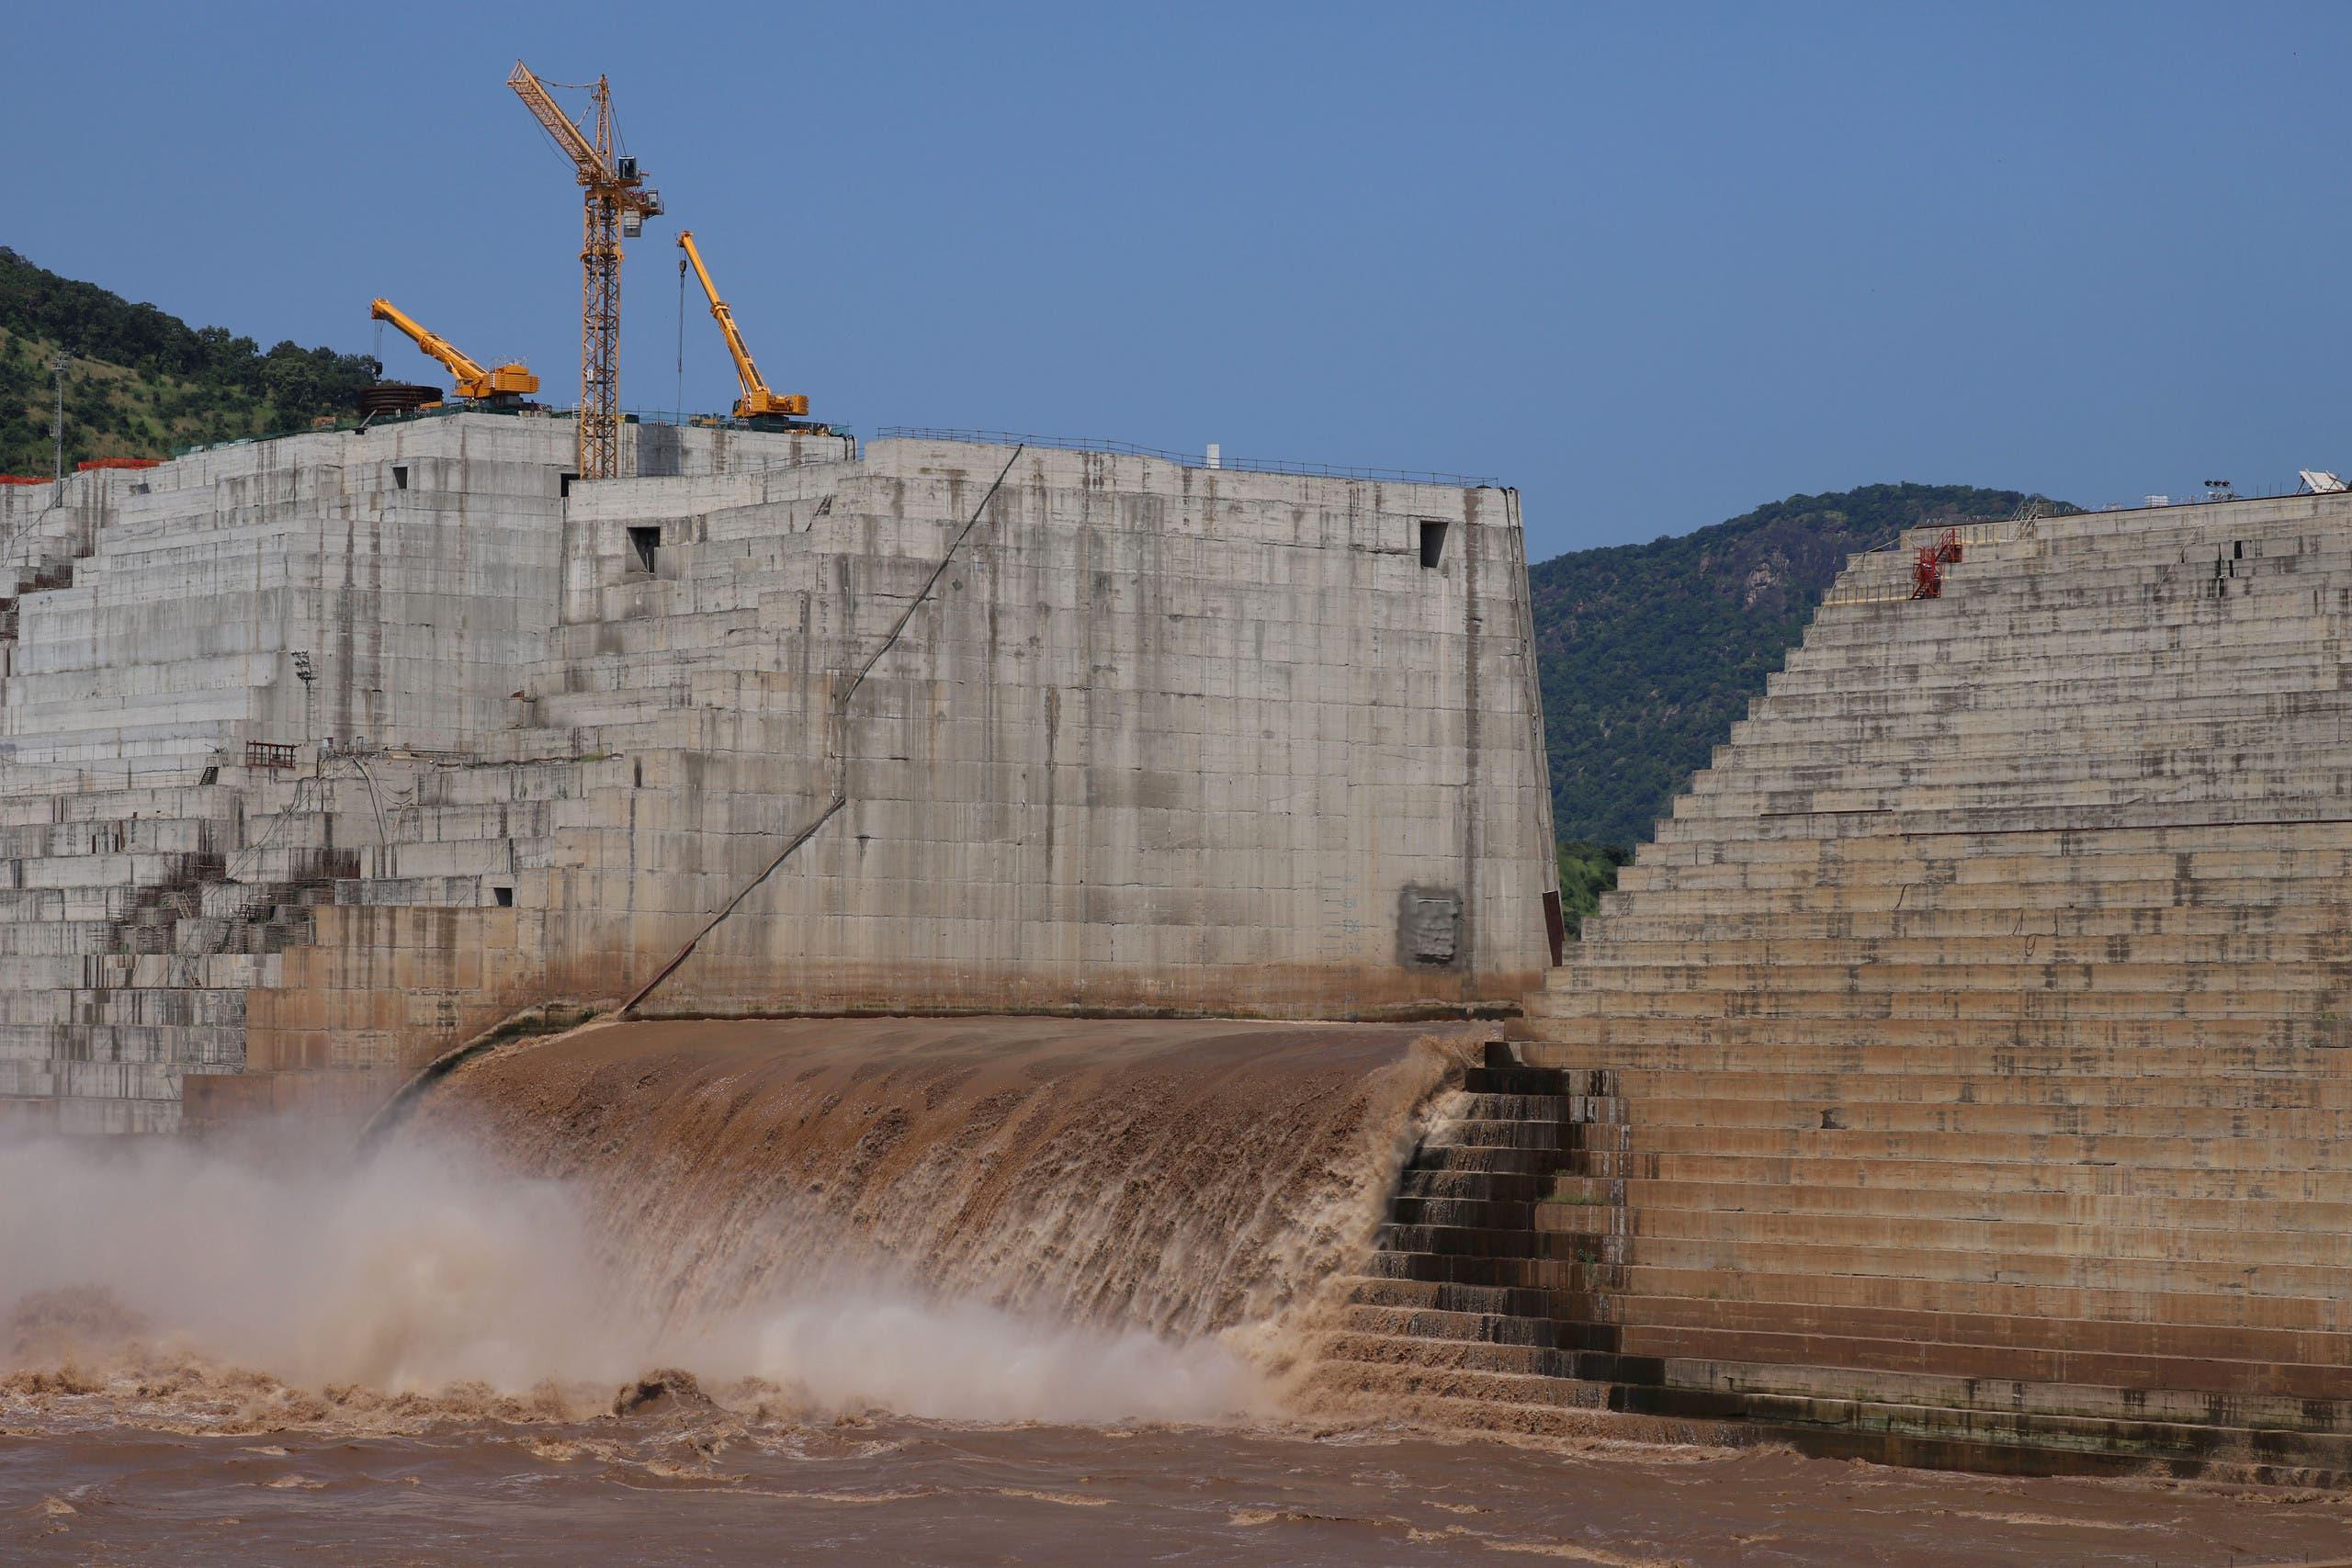 Water flows through Ethiopia's Grand Renaissance Dam as it undergoes construction work on the river Nile in Guba Woreda, Benishangul Gumuz Region, Ethiopia September 26, 2019. Picture taken September 26, 2019. (Reuters)